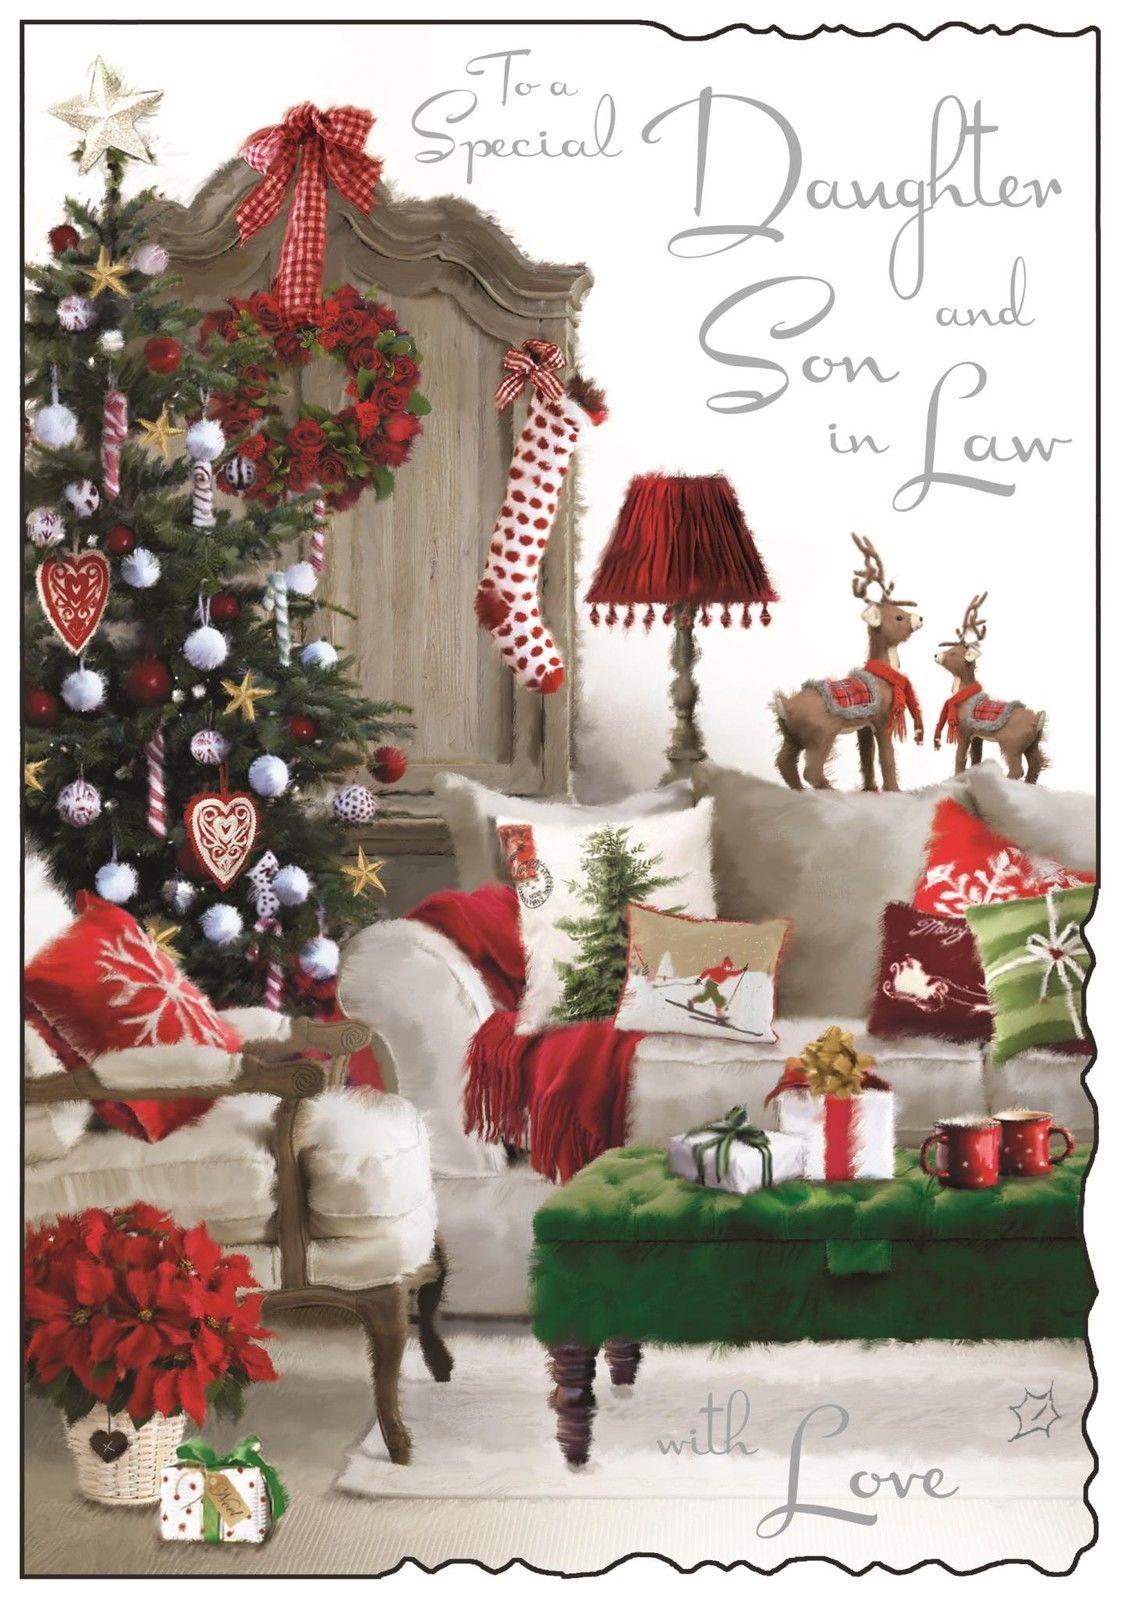 Jonny Javelin Daughter & SoninLaw Christmas Card Xmas